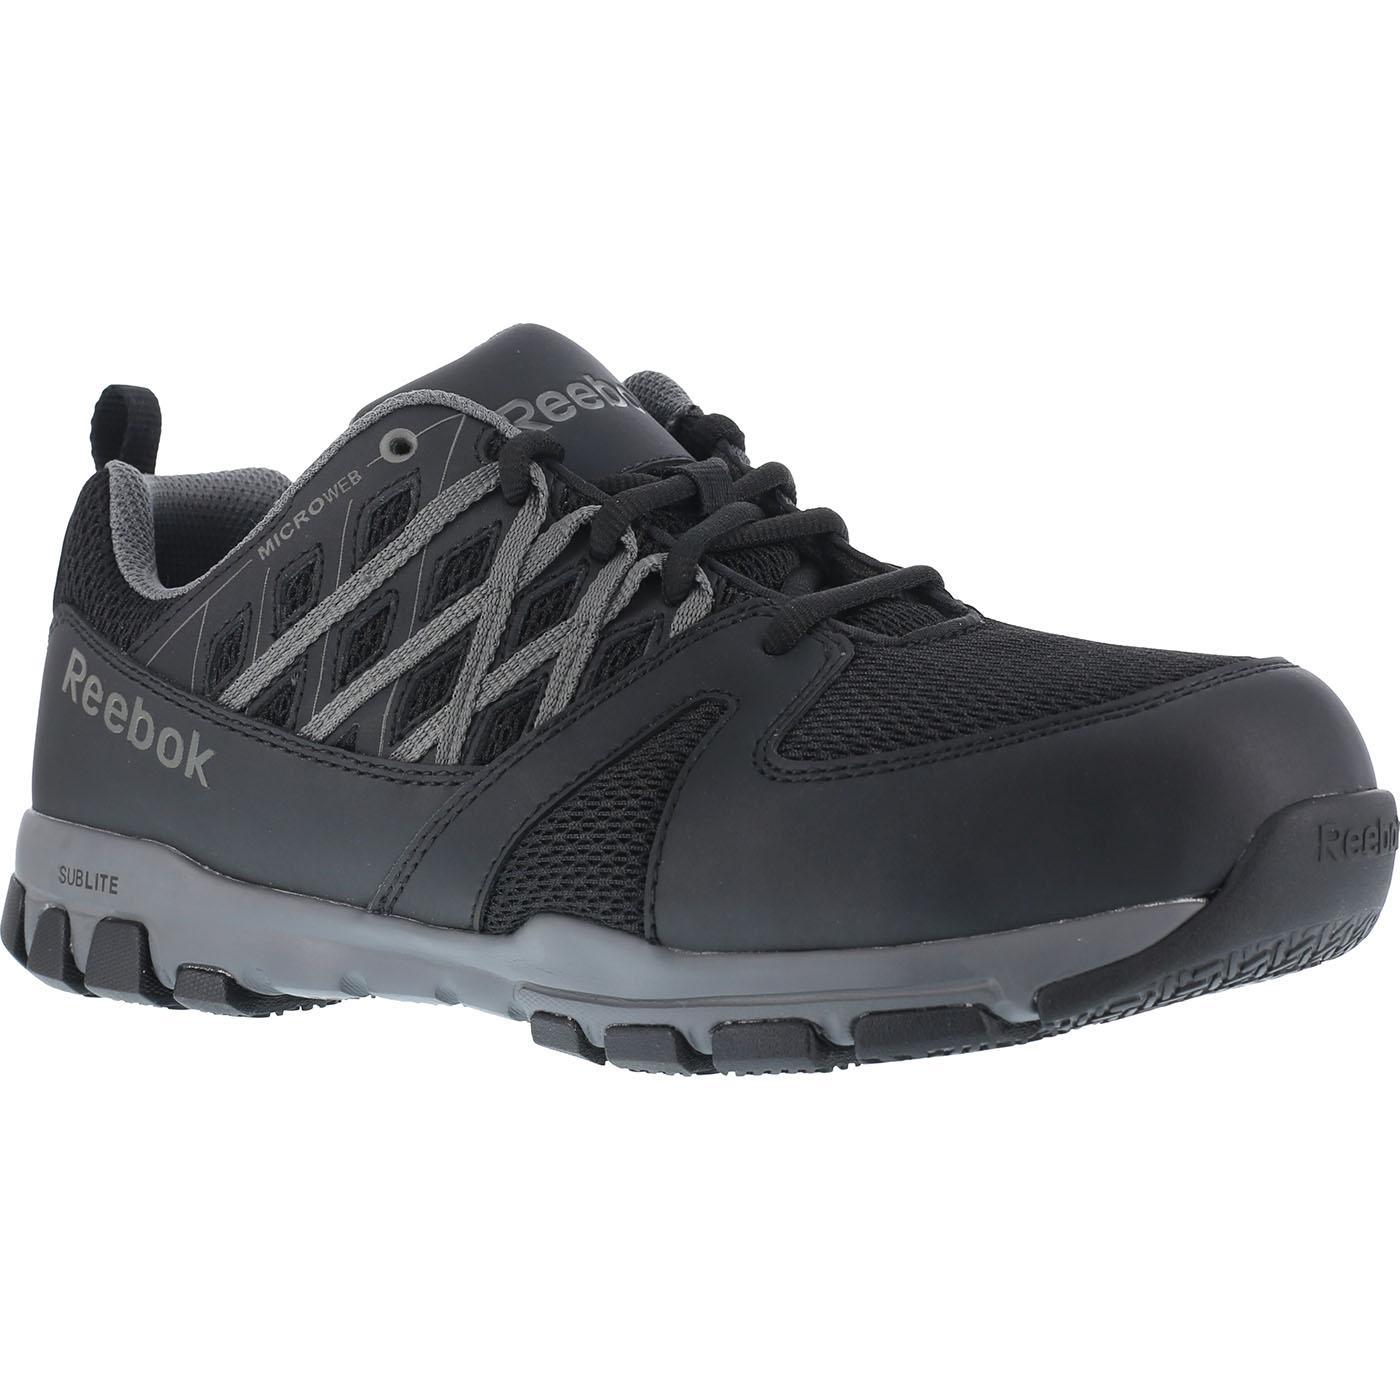 Good Looking Slip Resistant Shoes